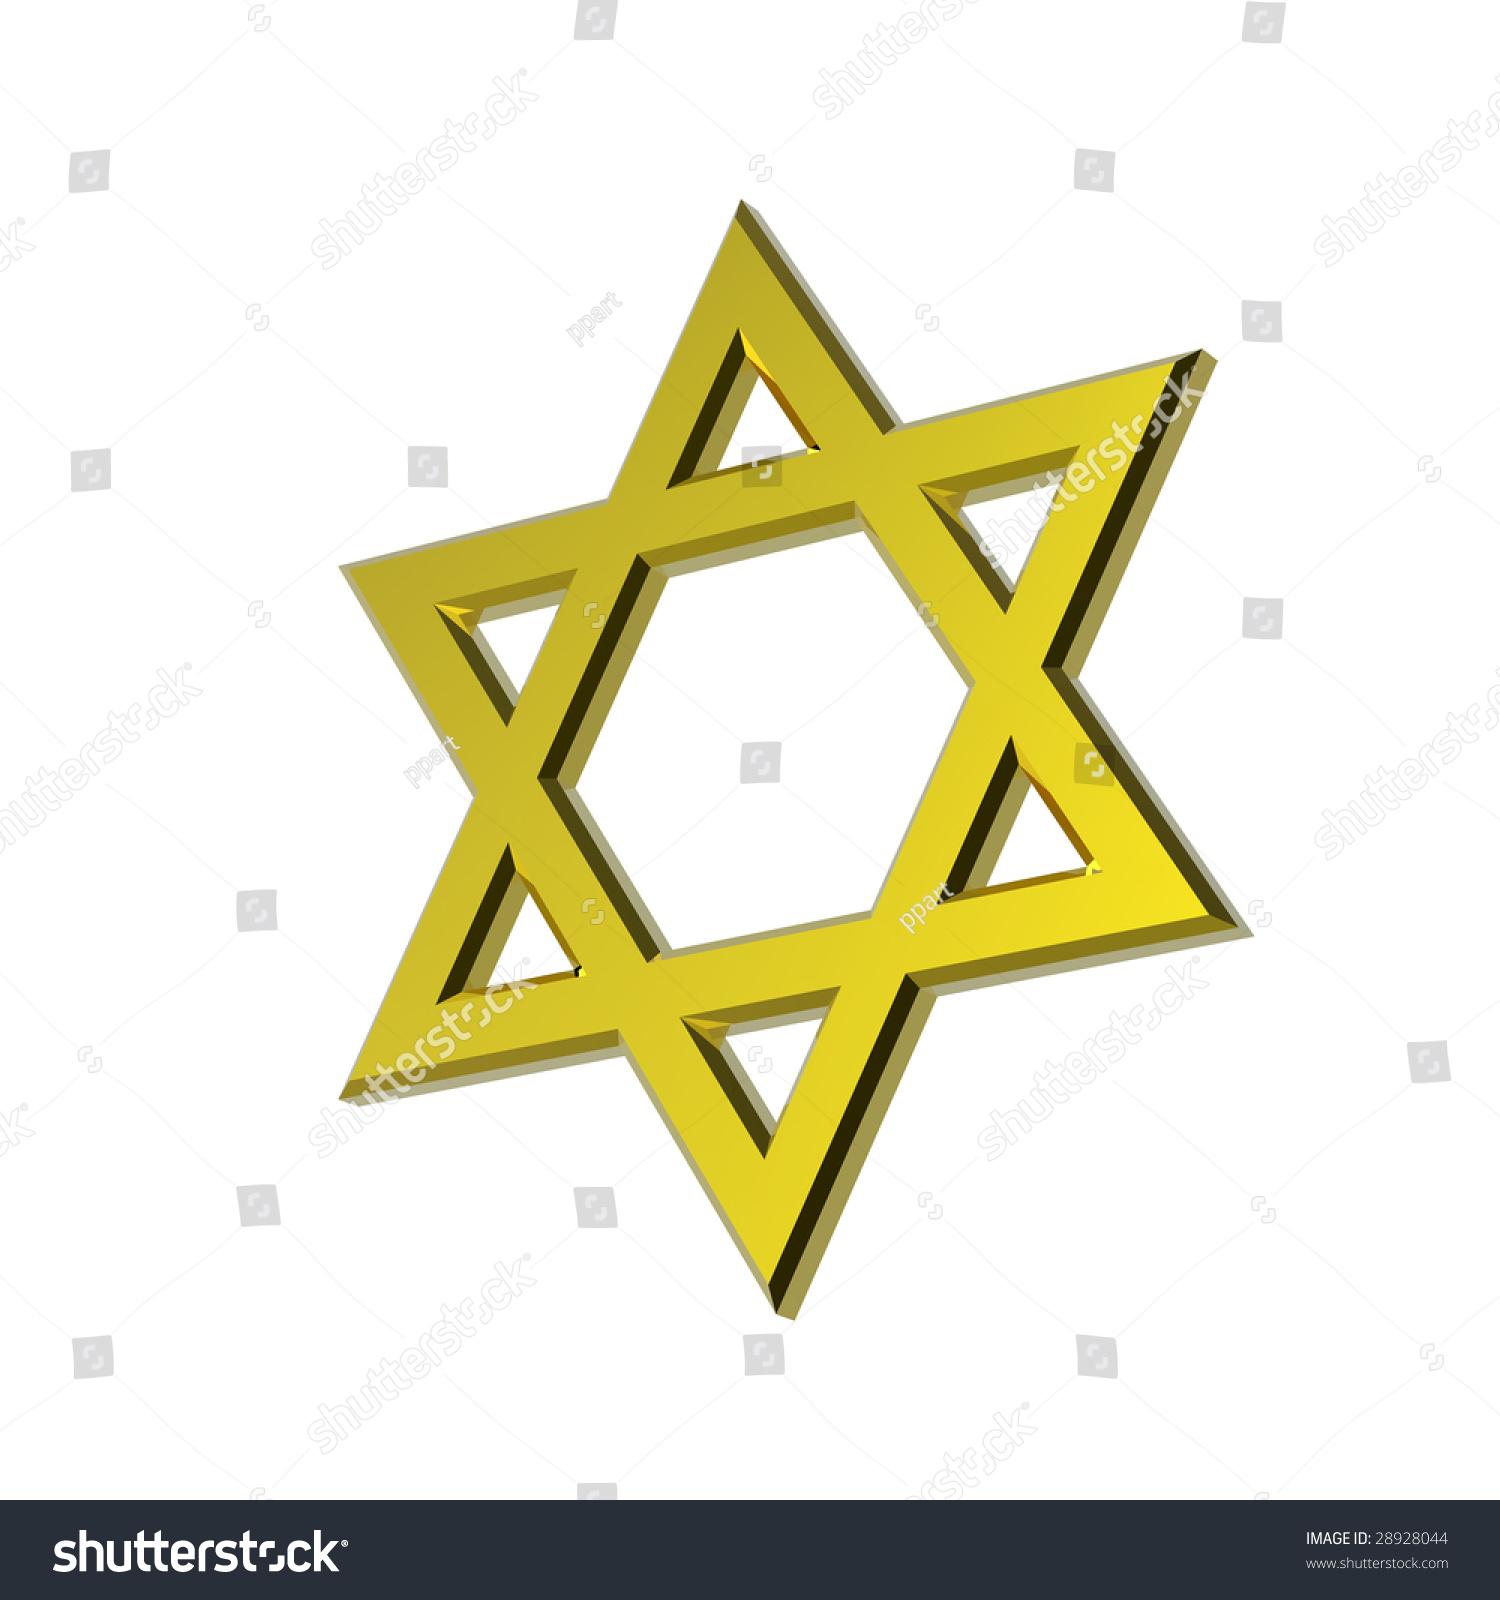 Gold Judaism Religious Symbol Star David Stock Illustration 28928044